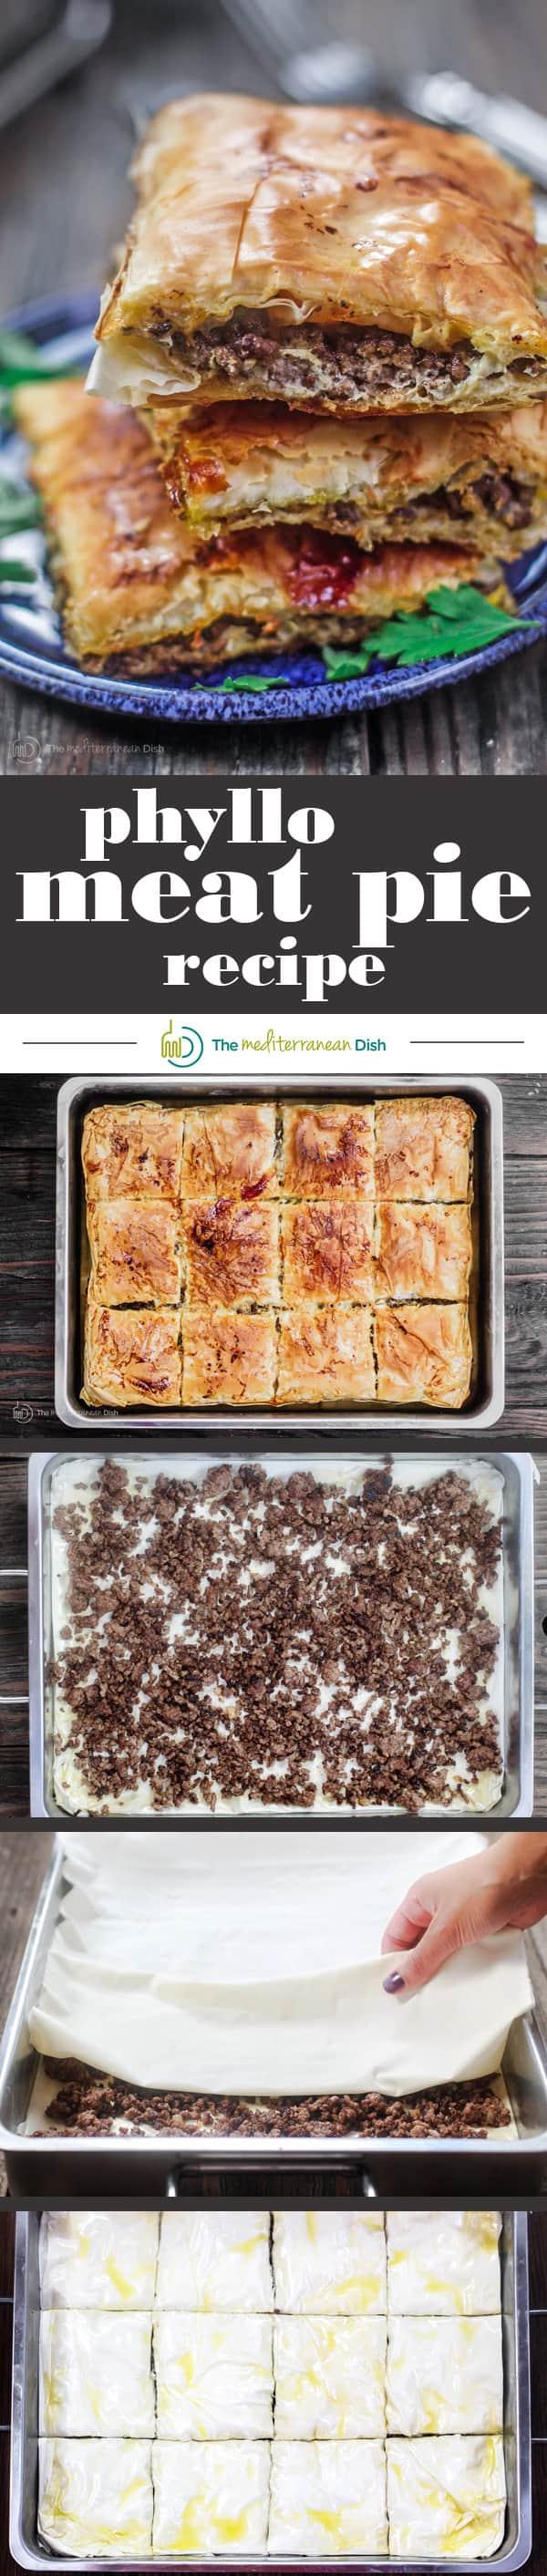 phyllo-meat-pie-recipe-egyptian-goulash-100